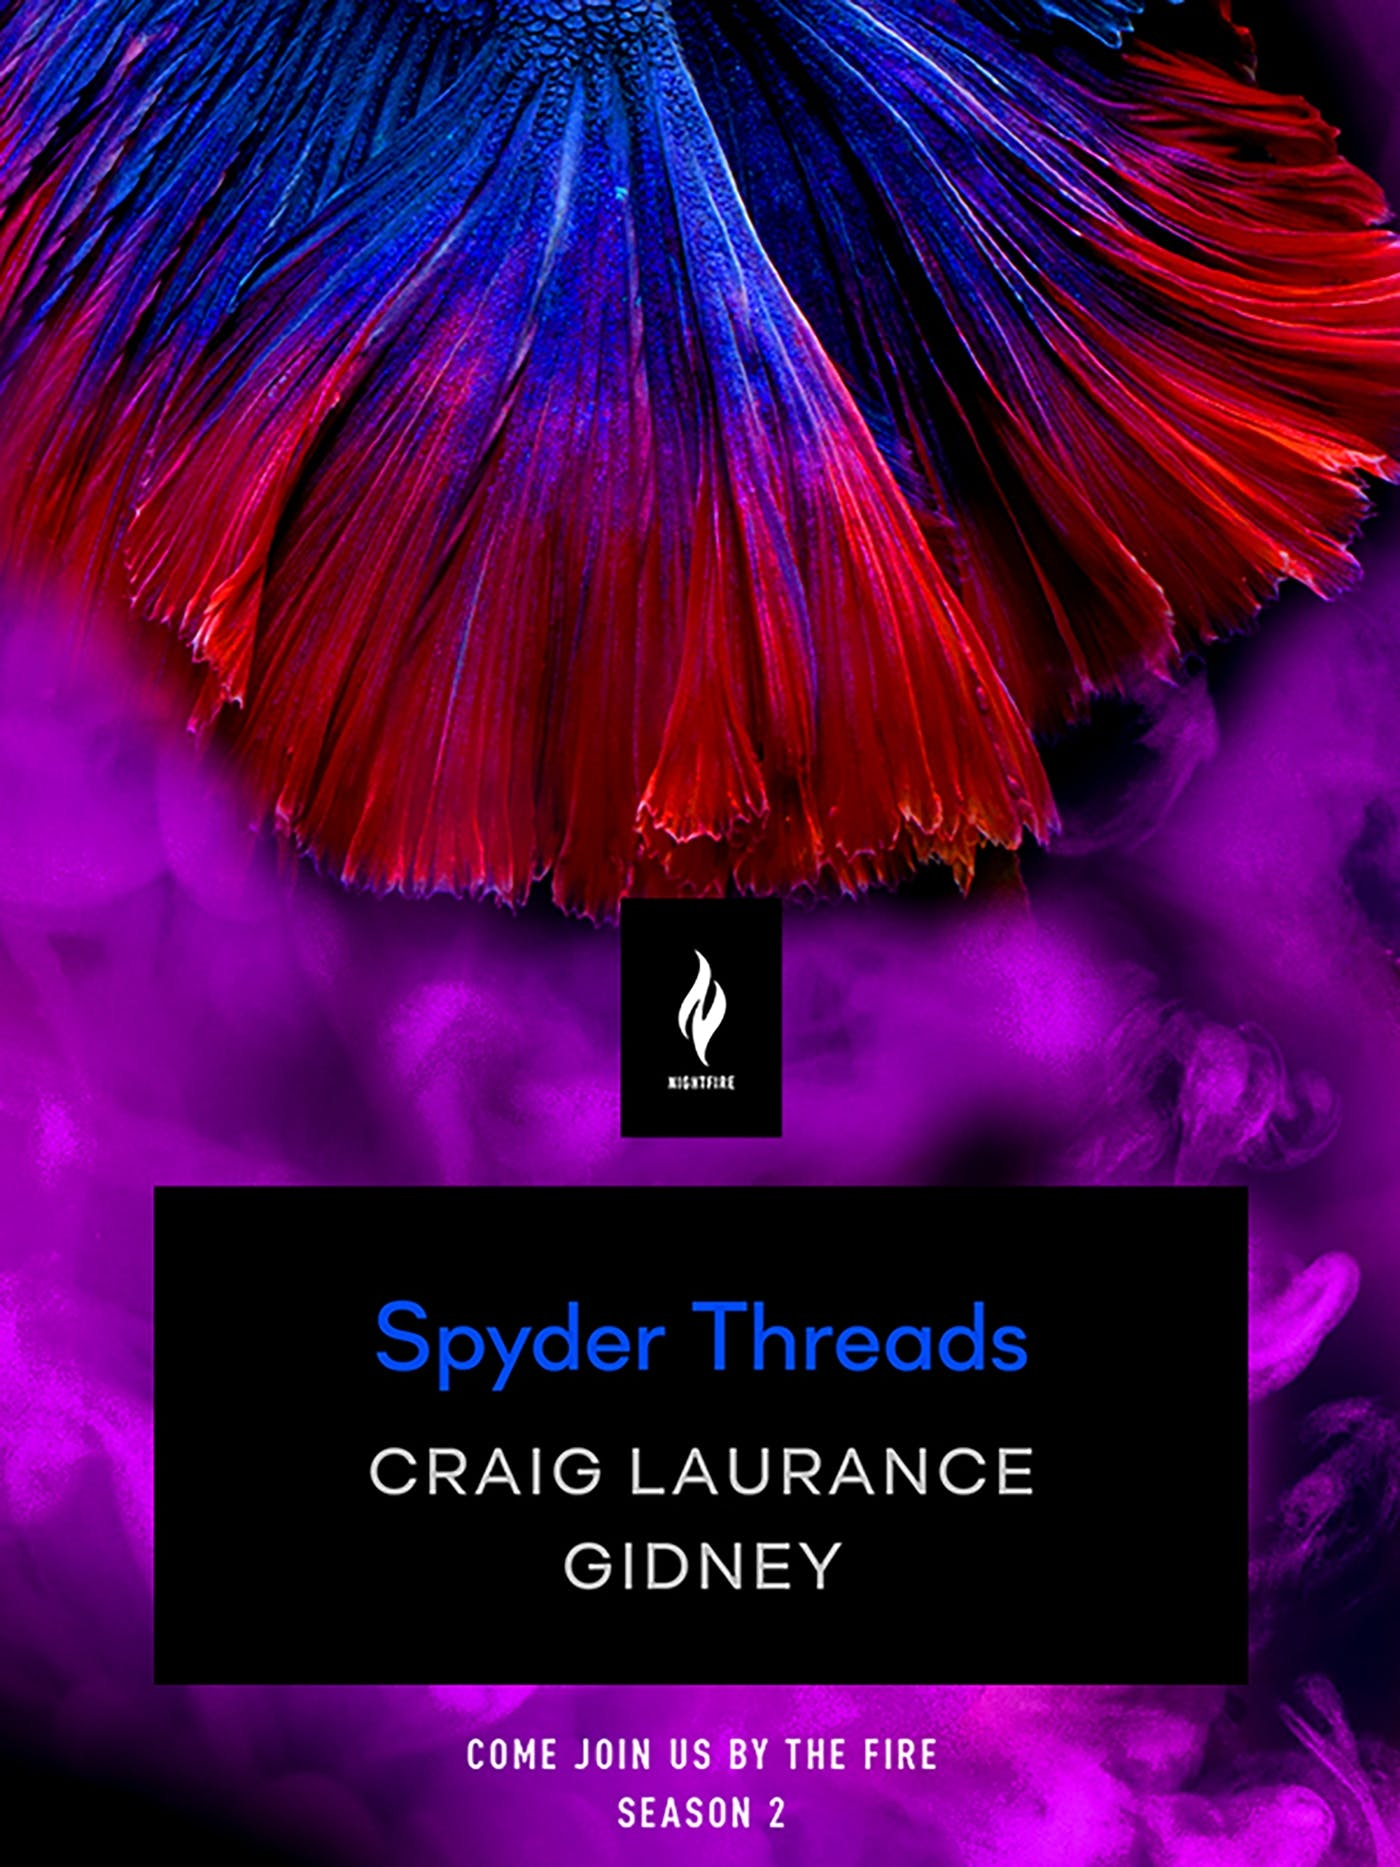 Image of Spyder Threads